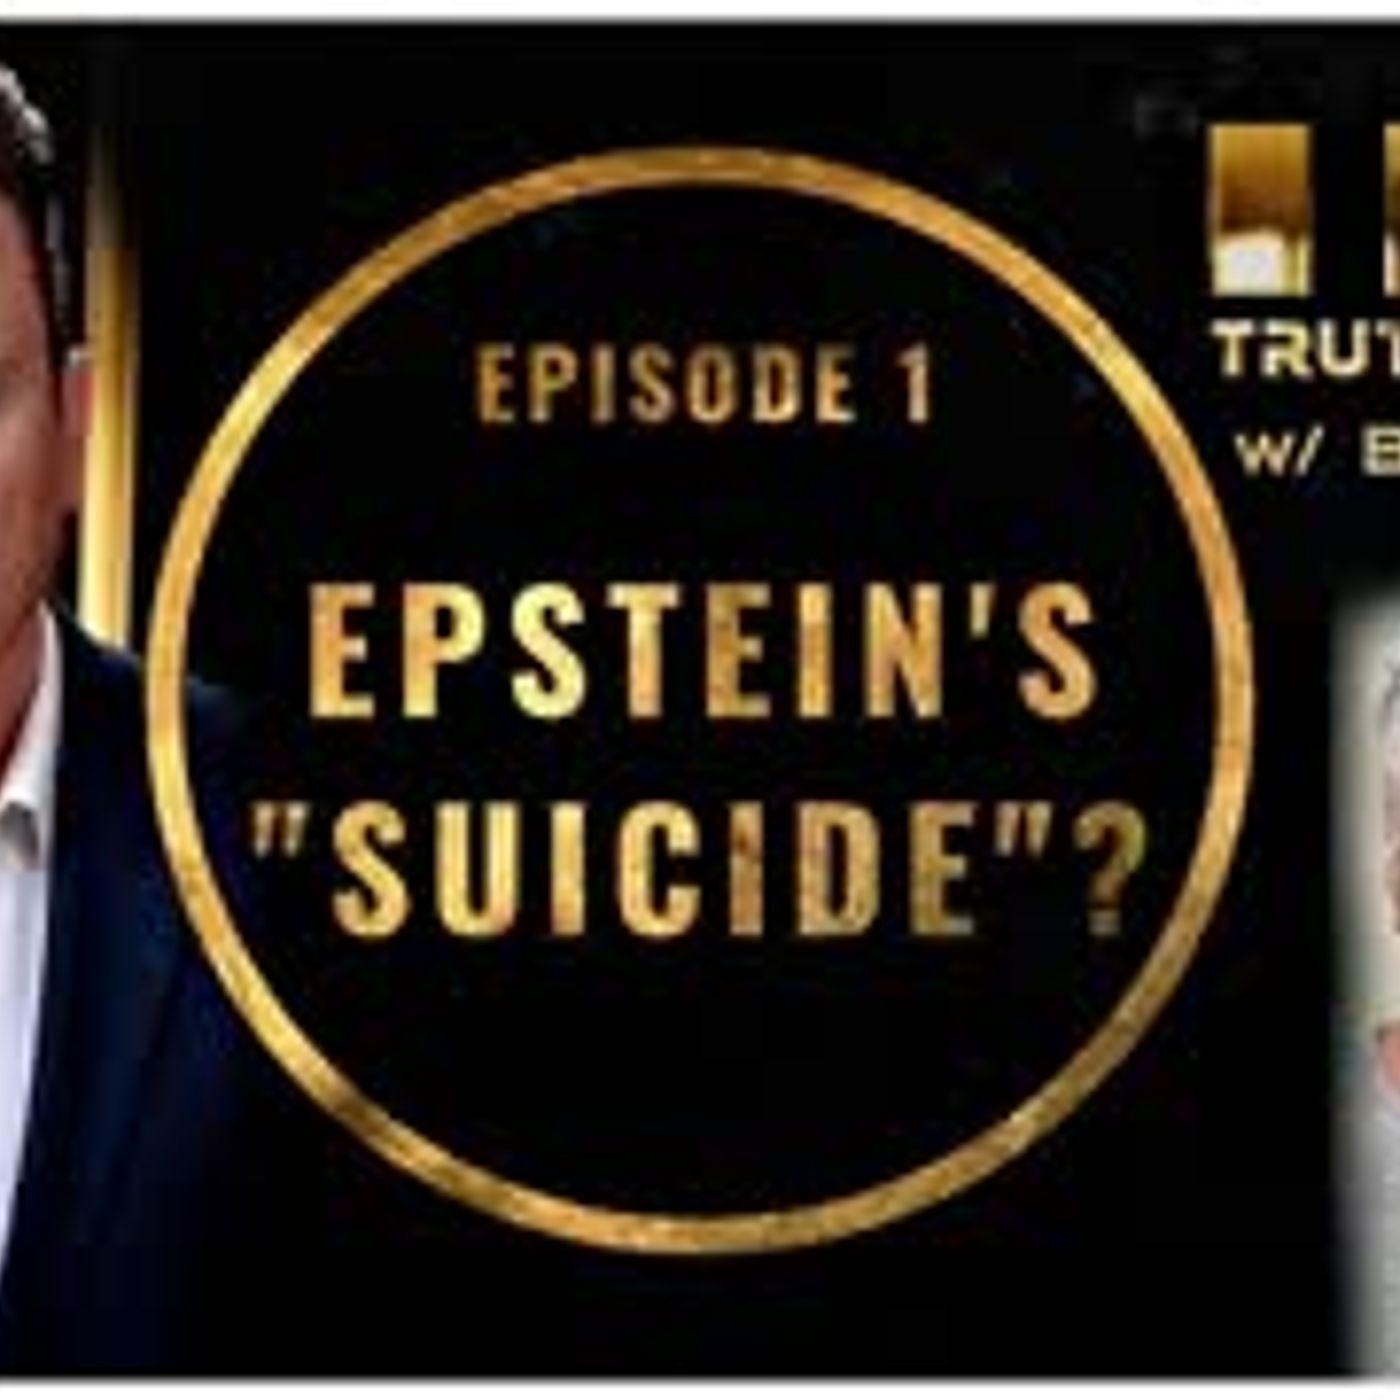 Jeffrey Epstein's Suicide, Co-conspirators A Deeper Look (TiM pc. 1)